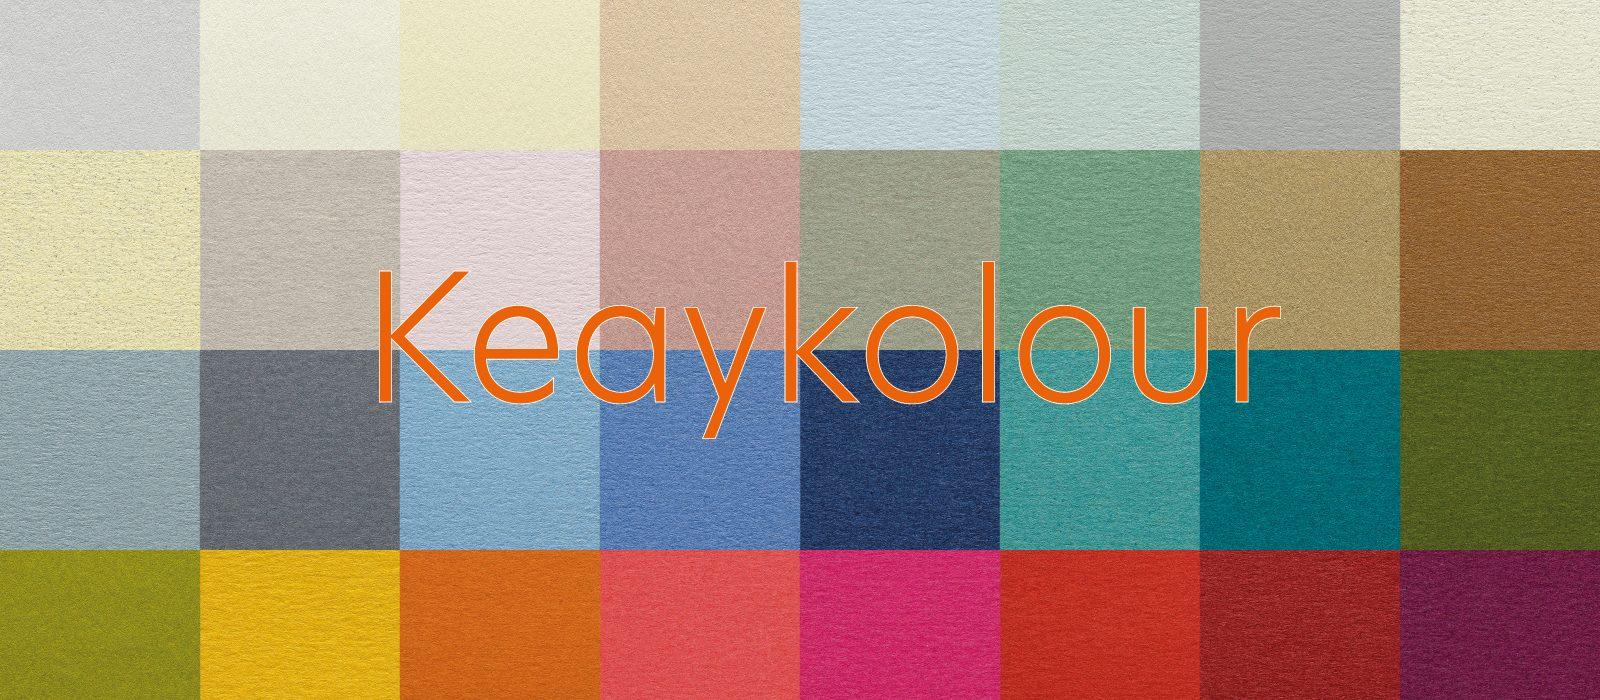 Keaykolour бумага Кейколор